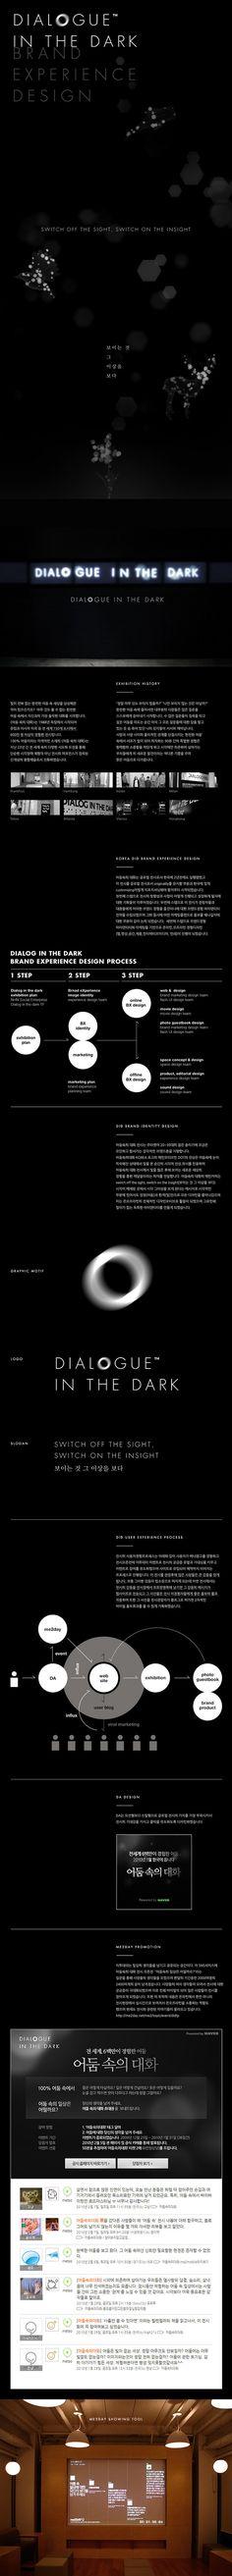 Dialog in the dark (Korea) Brand experience design on Behance